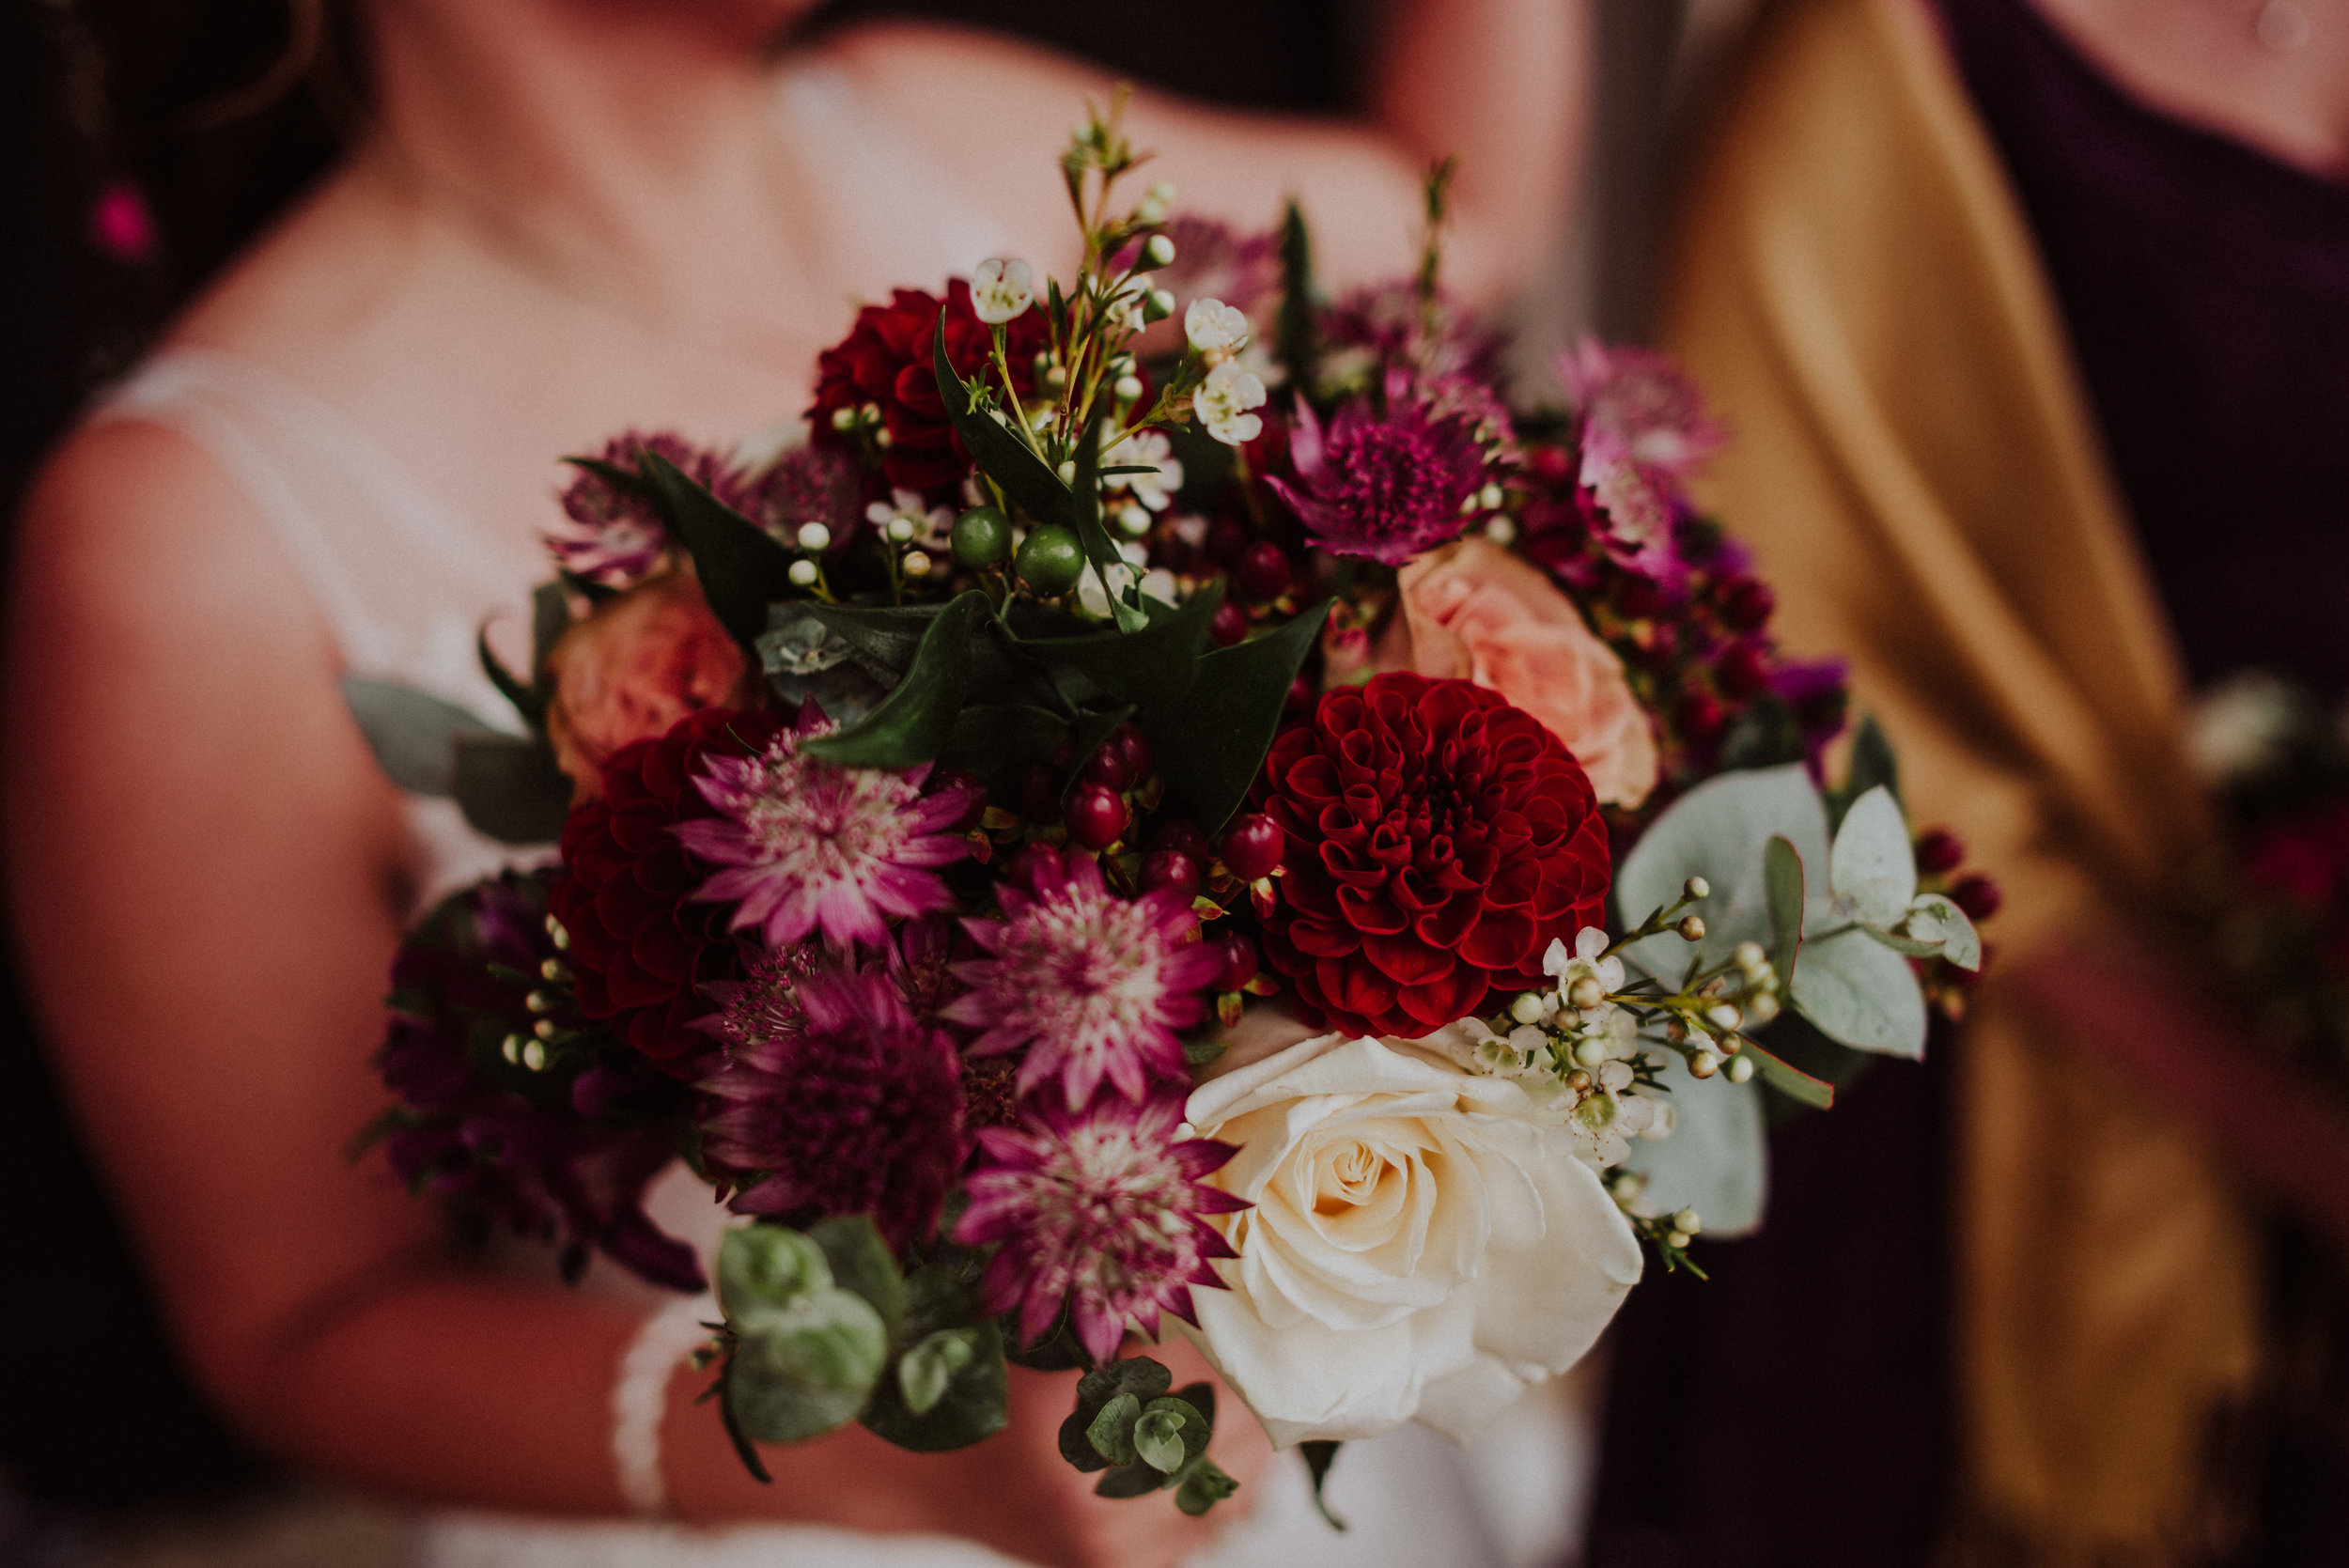 port-eliot-wedding-photographer-34.jpg